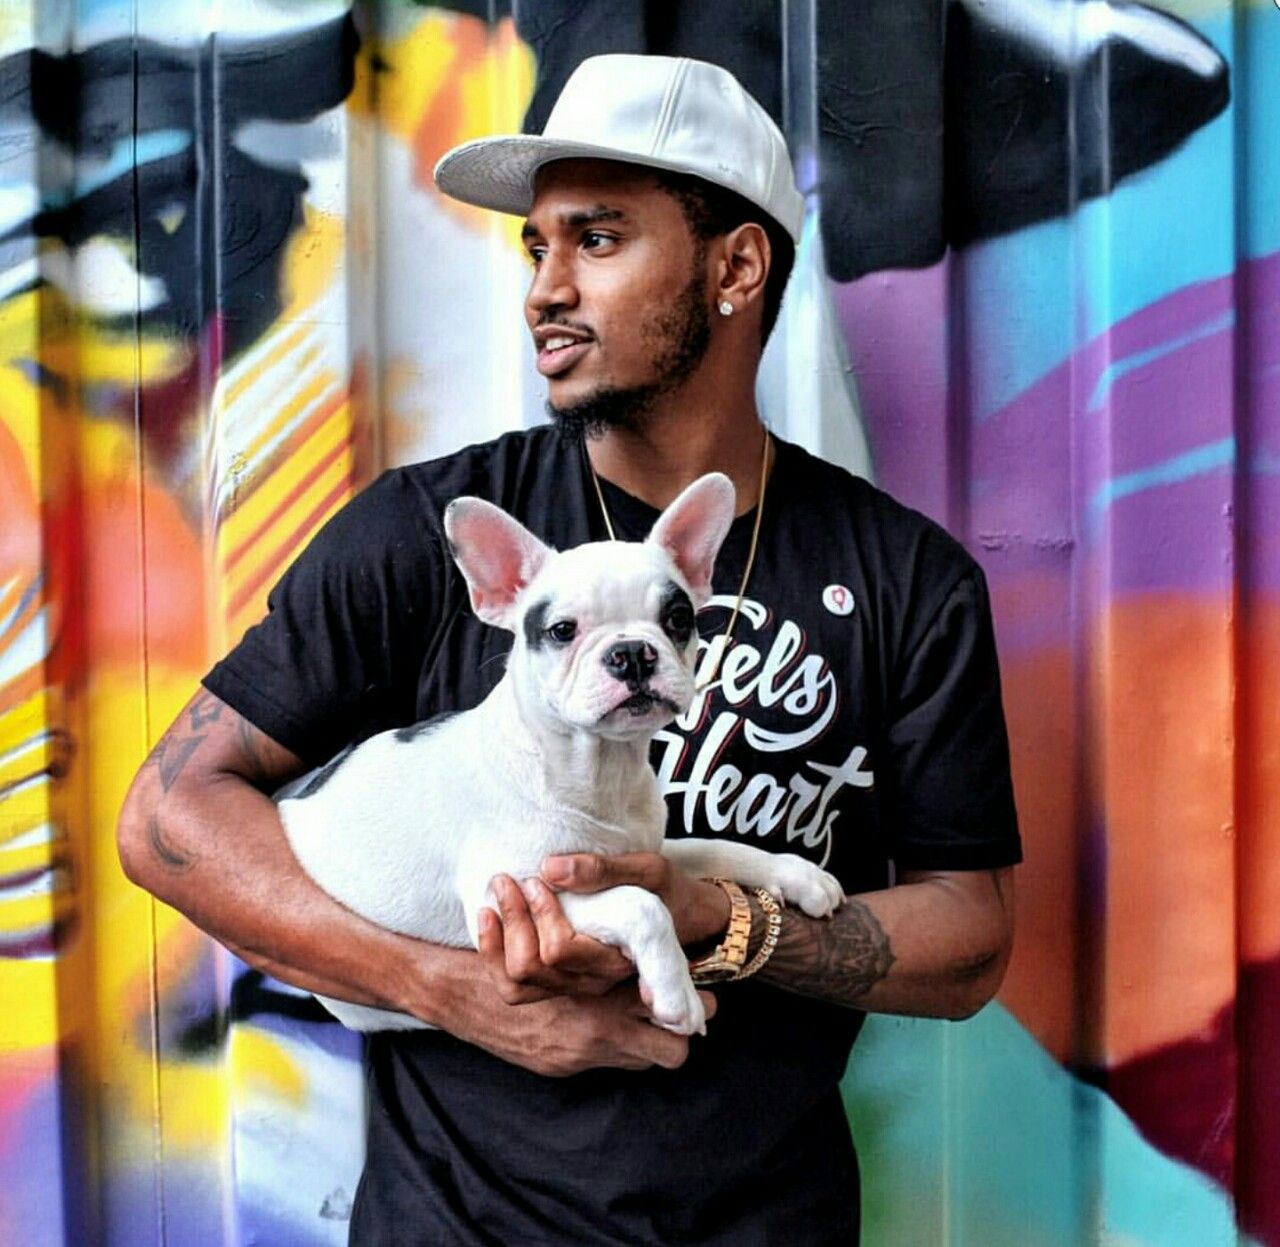 Tremaine | Crazy dog lady. Trey songs. Dogs